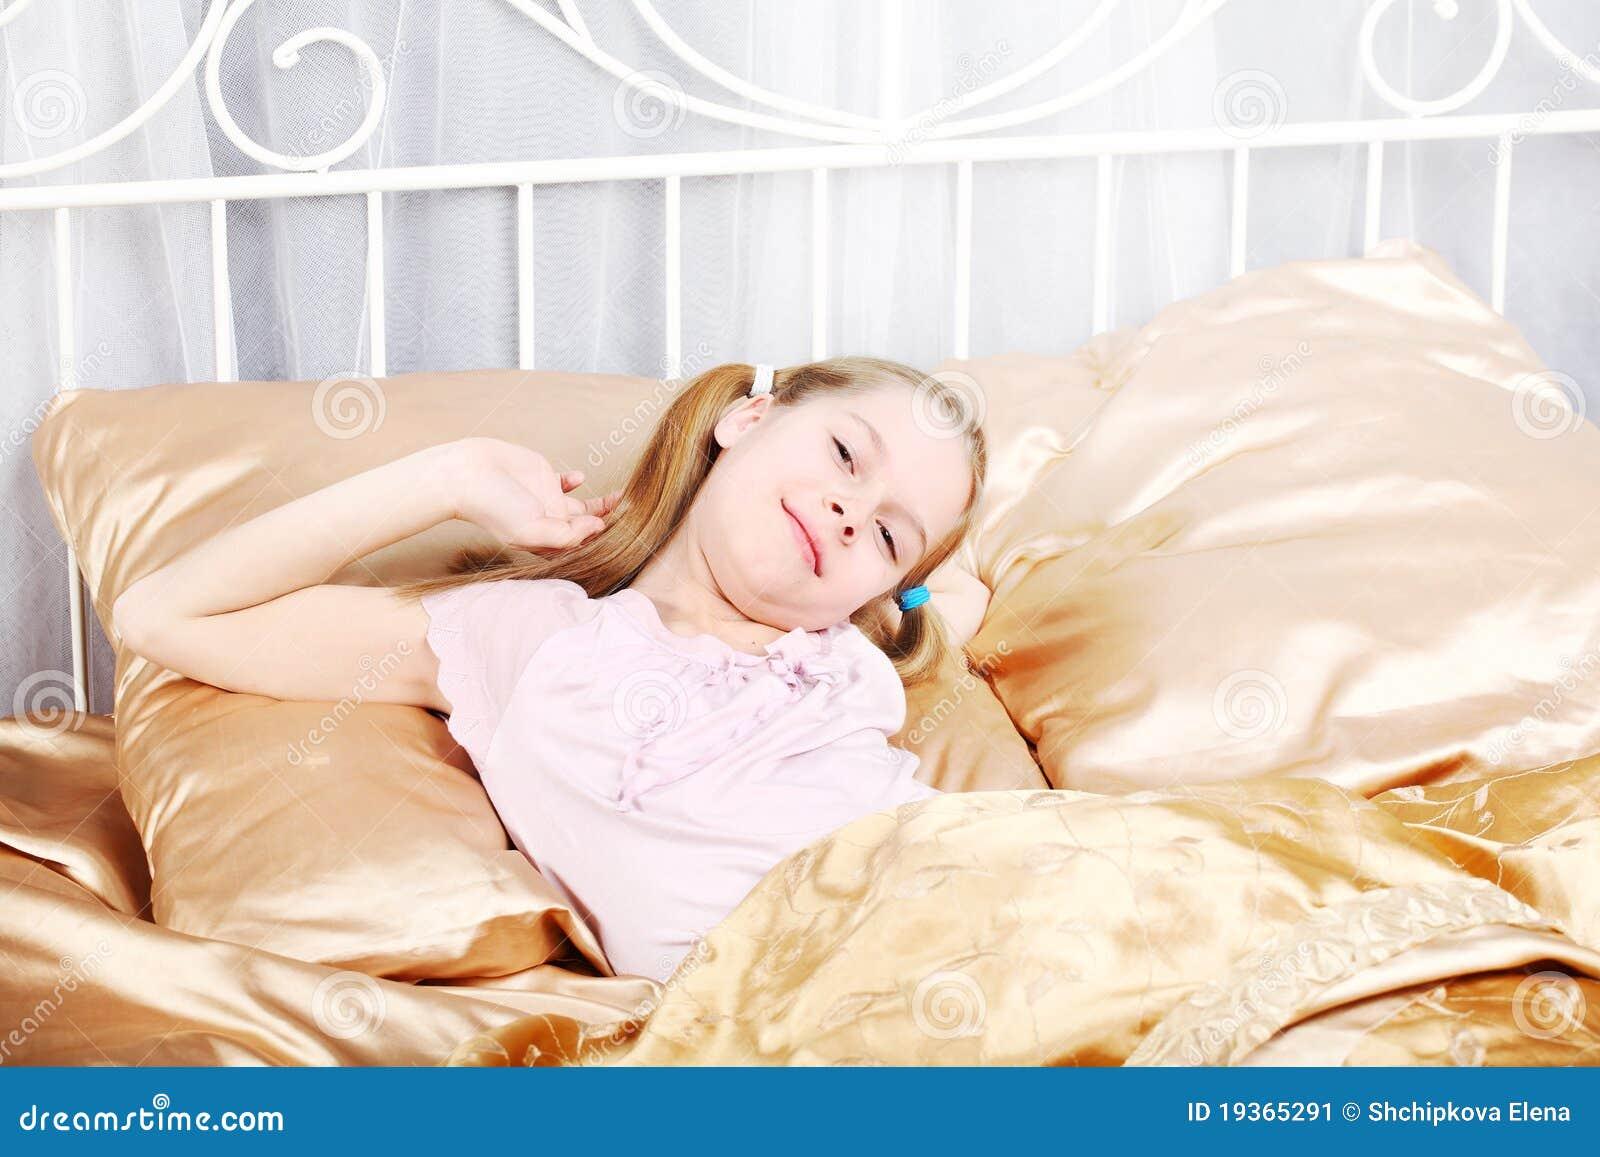 A menina de dez anos acordou